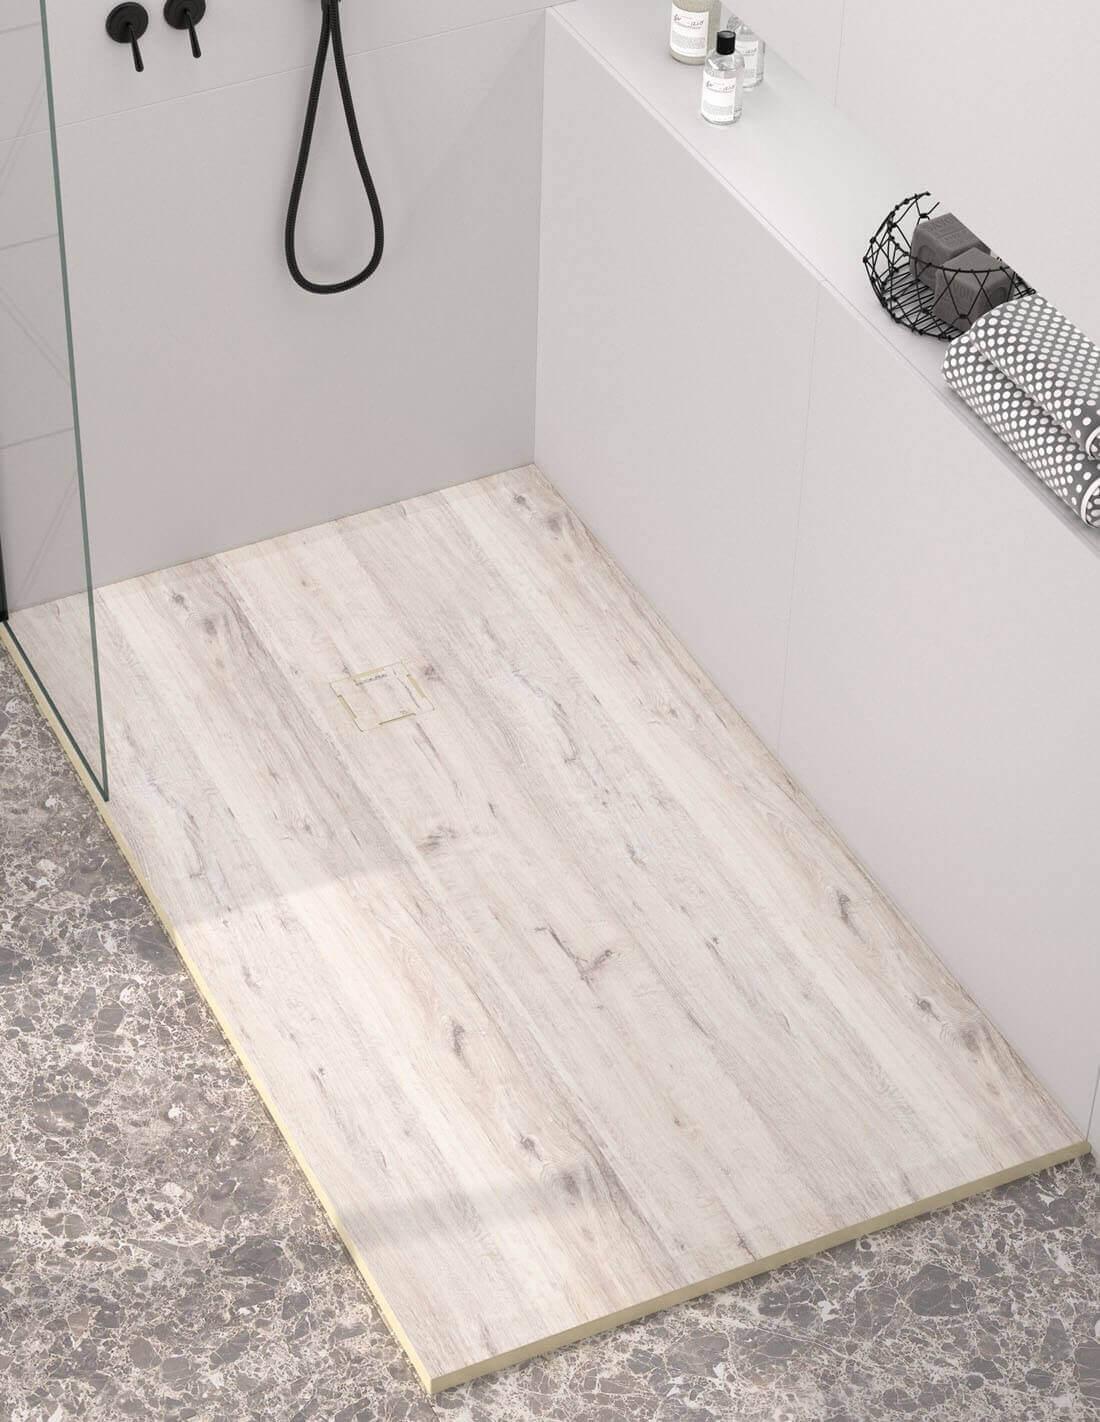 Plato de ducha de madera